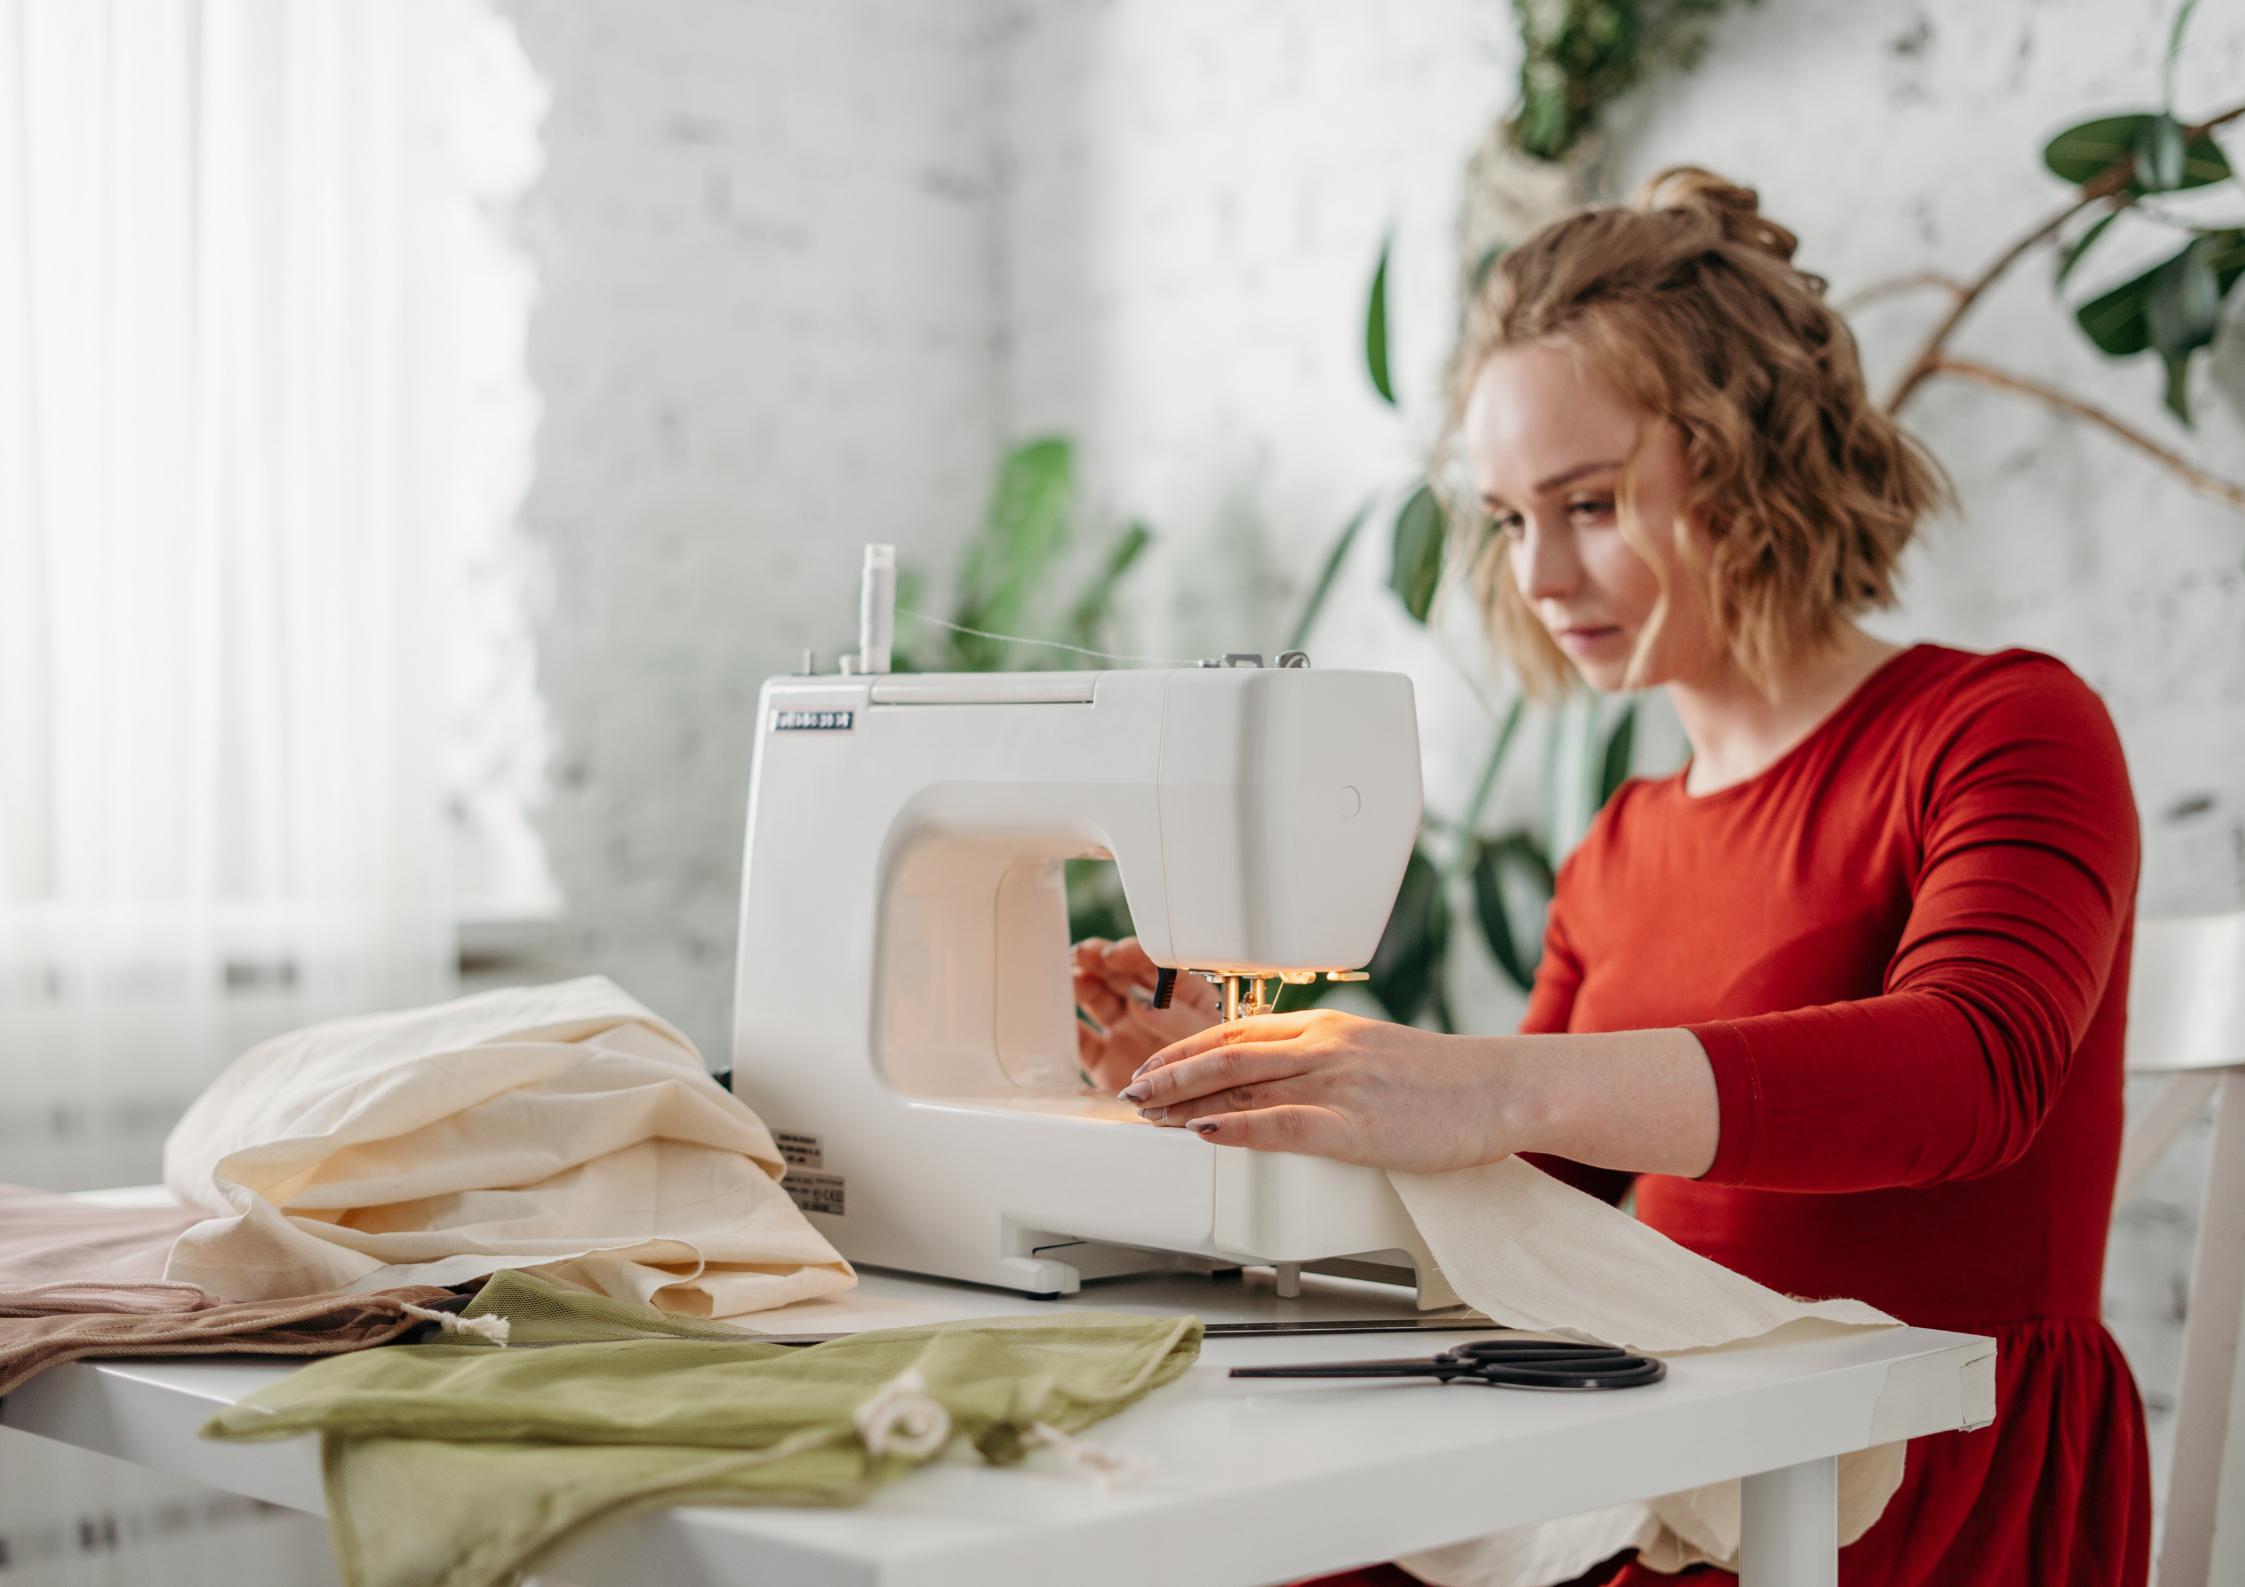 Technical Skills - Sewing a Garment